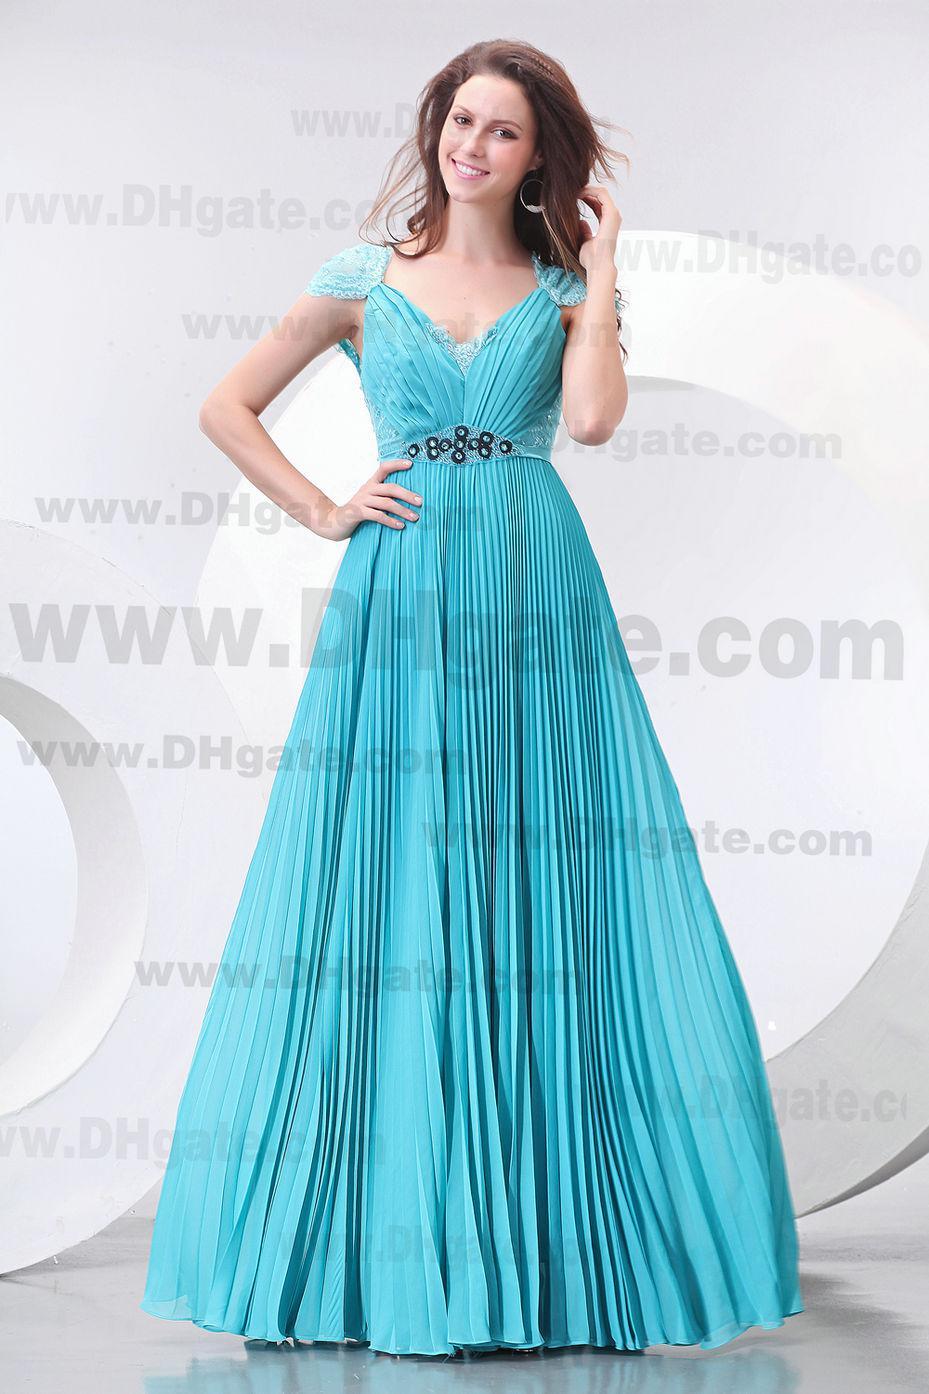 2021 Kate Princess Floor Lengte Prom Gowns V-hals Kant Back Mooie Hunter Chiffon Avondjurk ED089